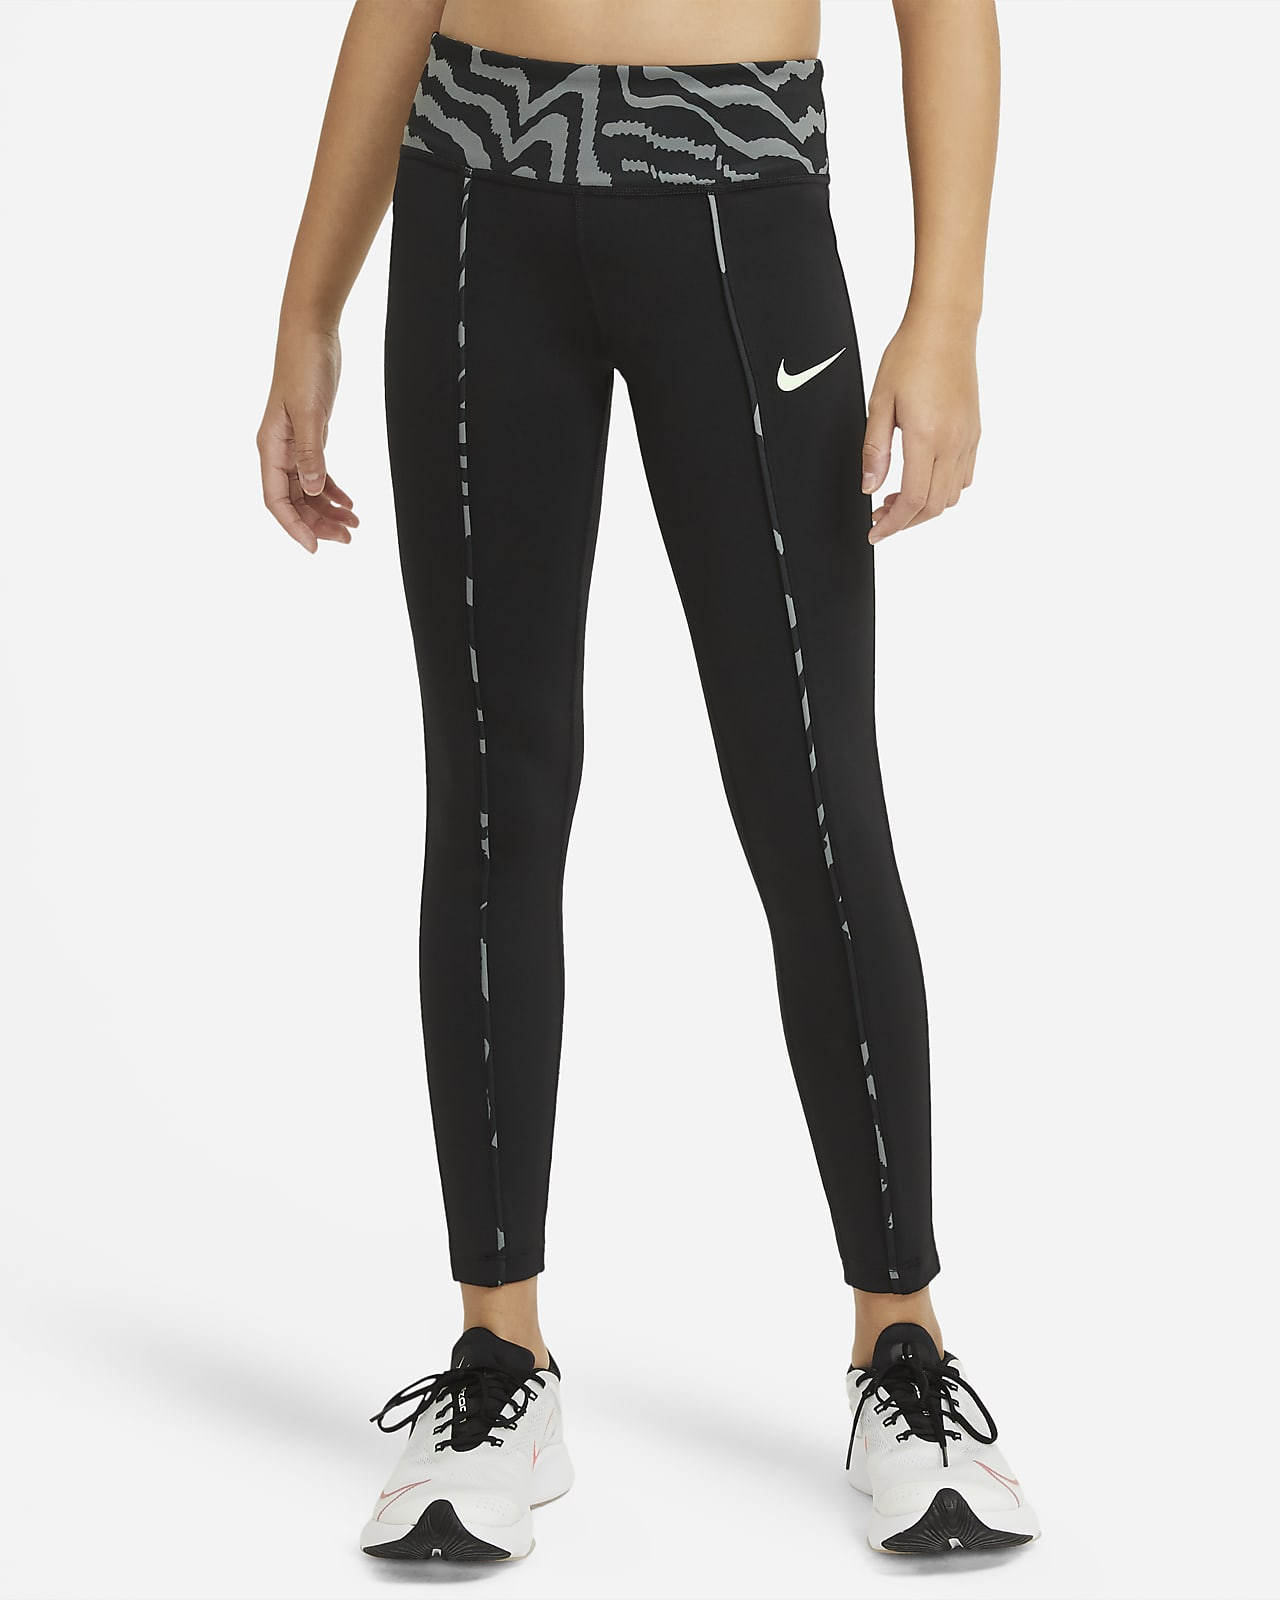 Nike One Older Kids' (Girls') Mid-Rise Printed Leggings